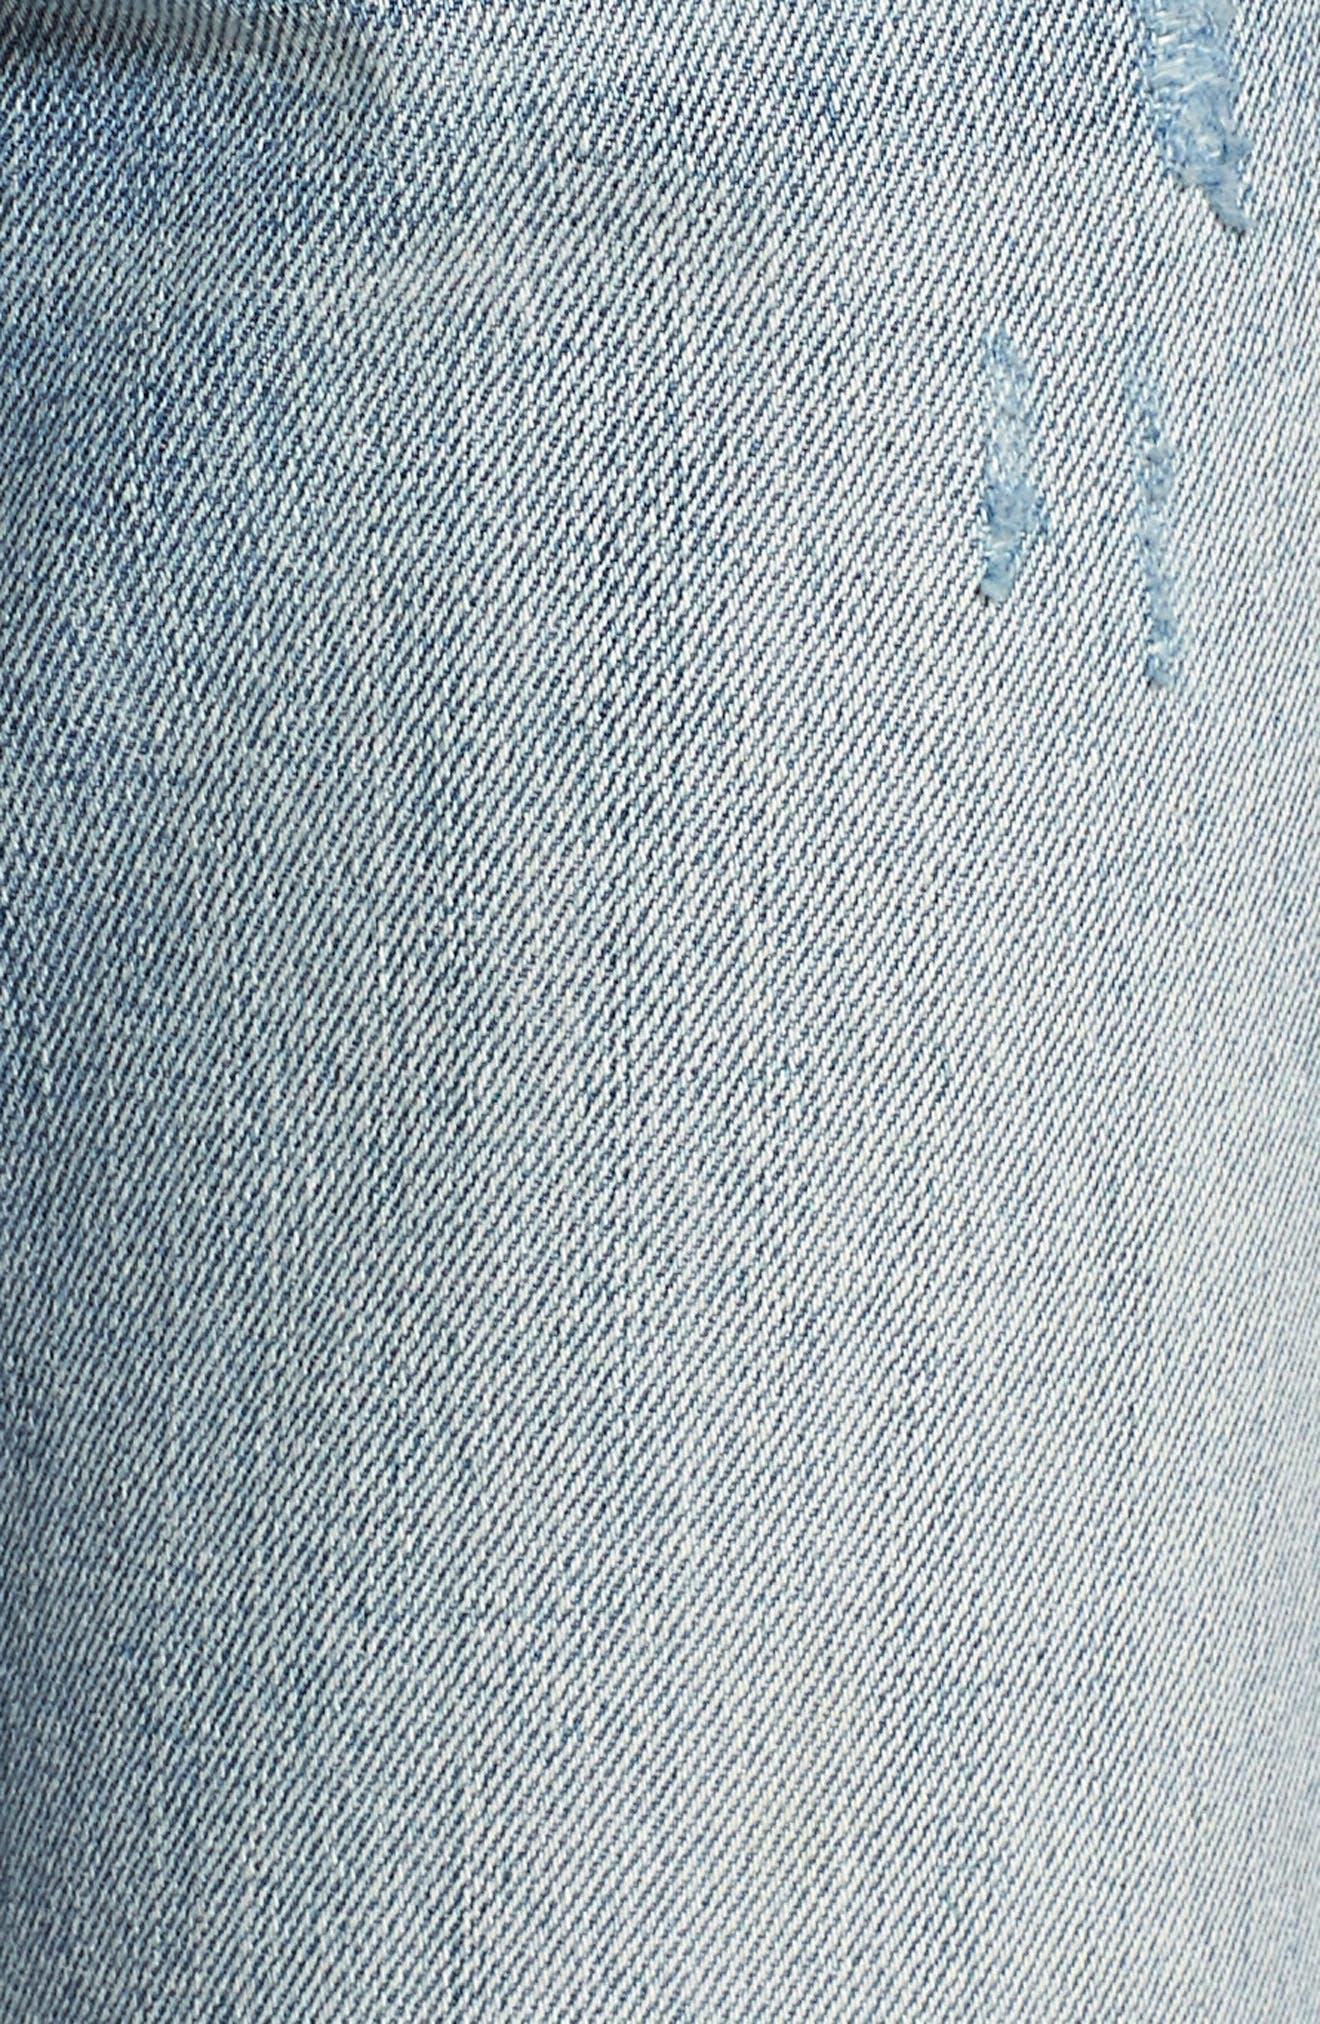 Now or Never Side Stripe Skinny Jeans,                             Alternate thumbnail 6, color,                             Blue